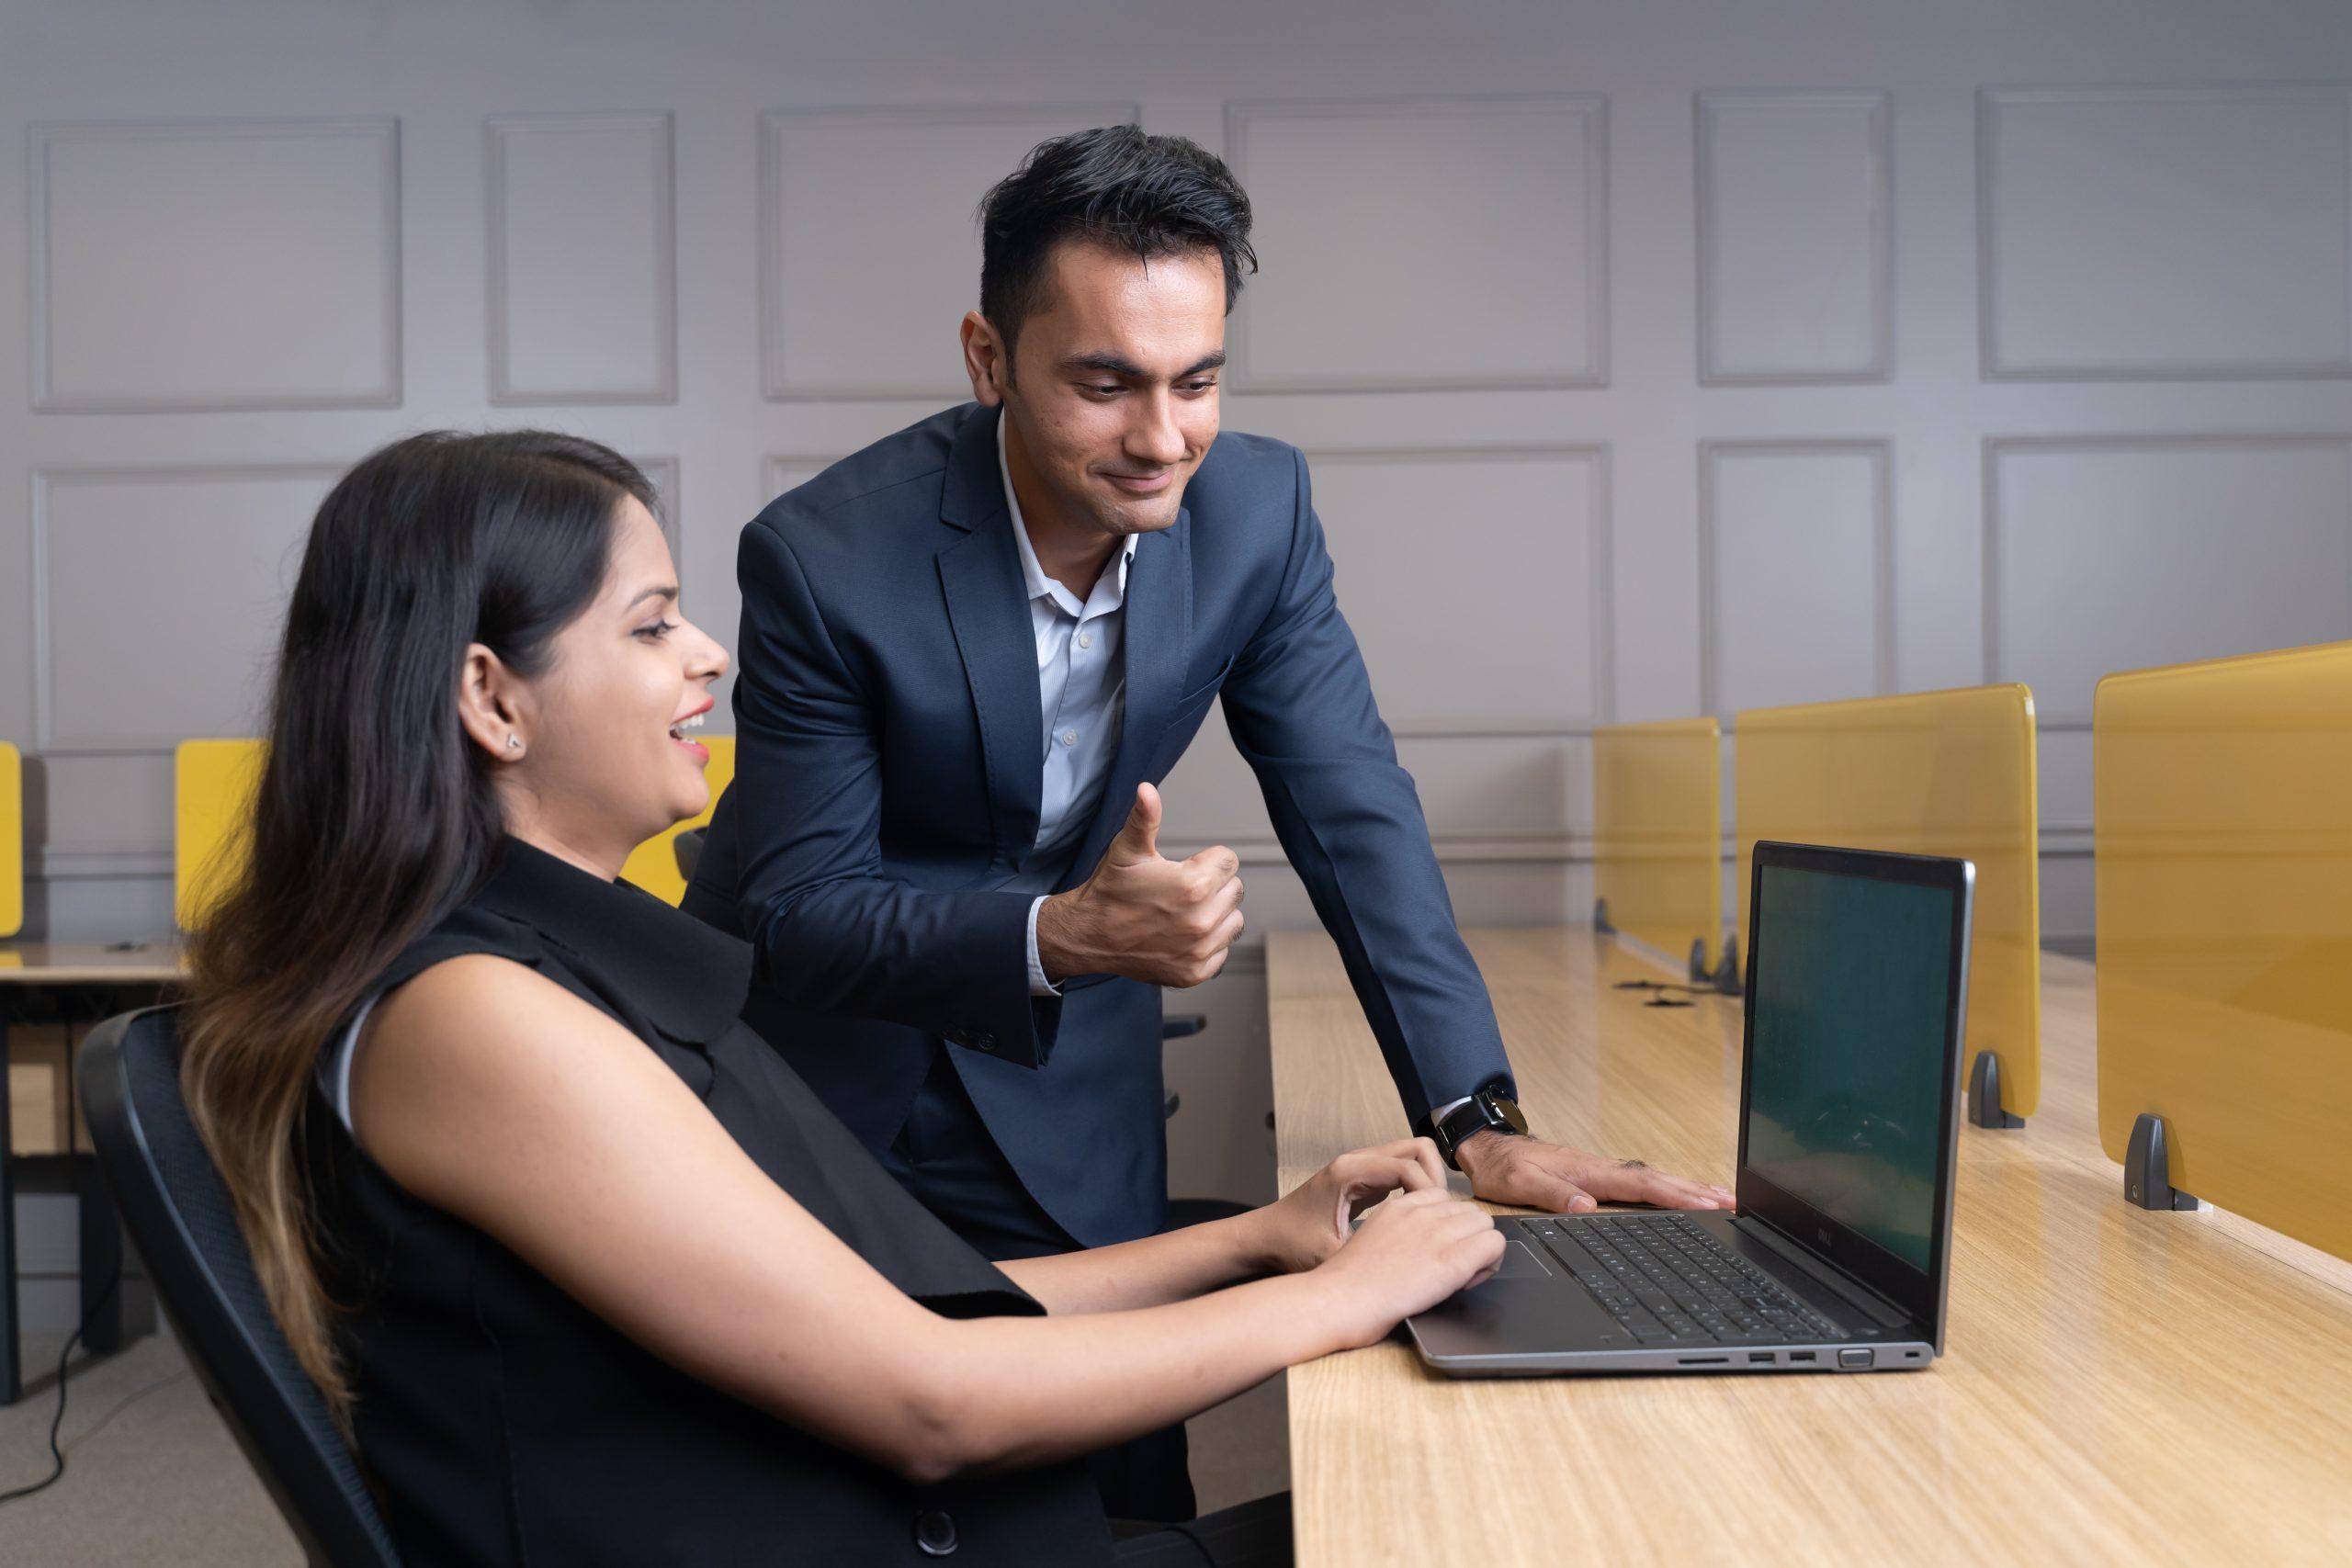 Manager appreciating executive's work